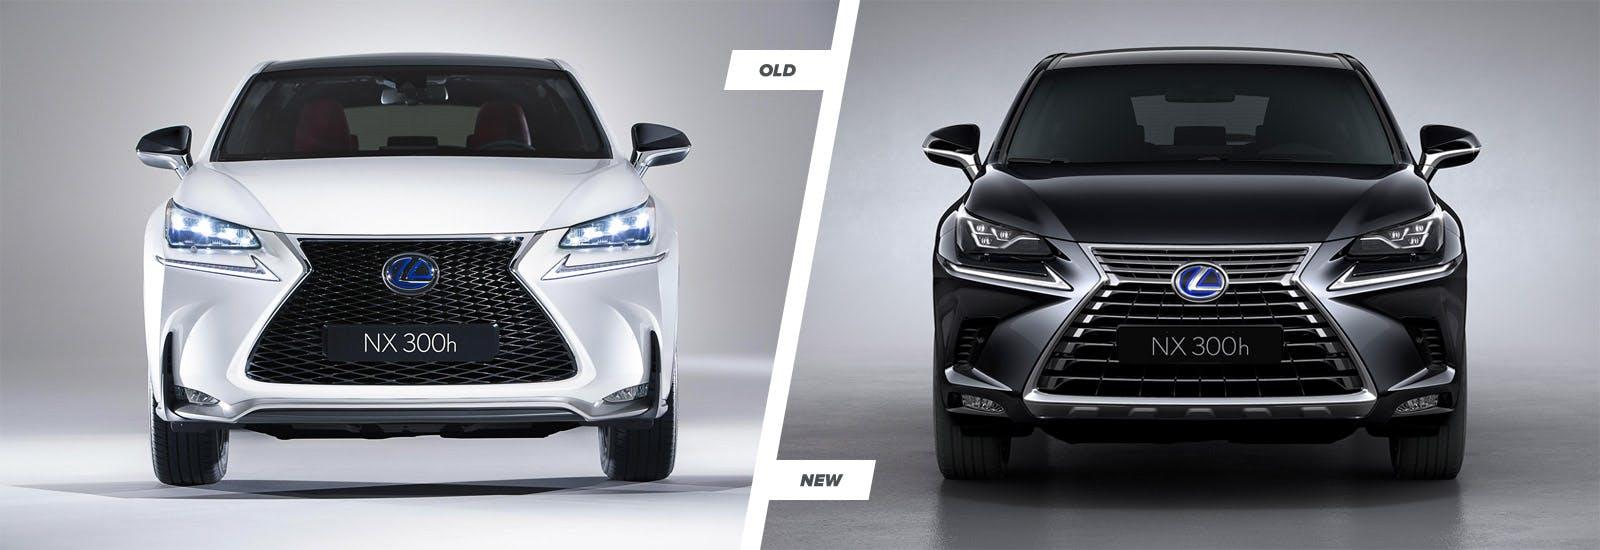 2018 Lexus Nx Facelift Styling